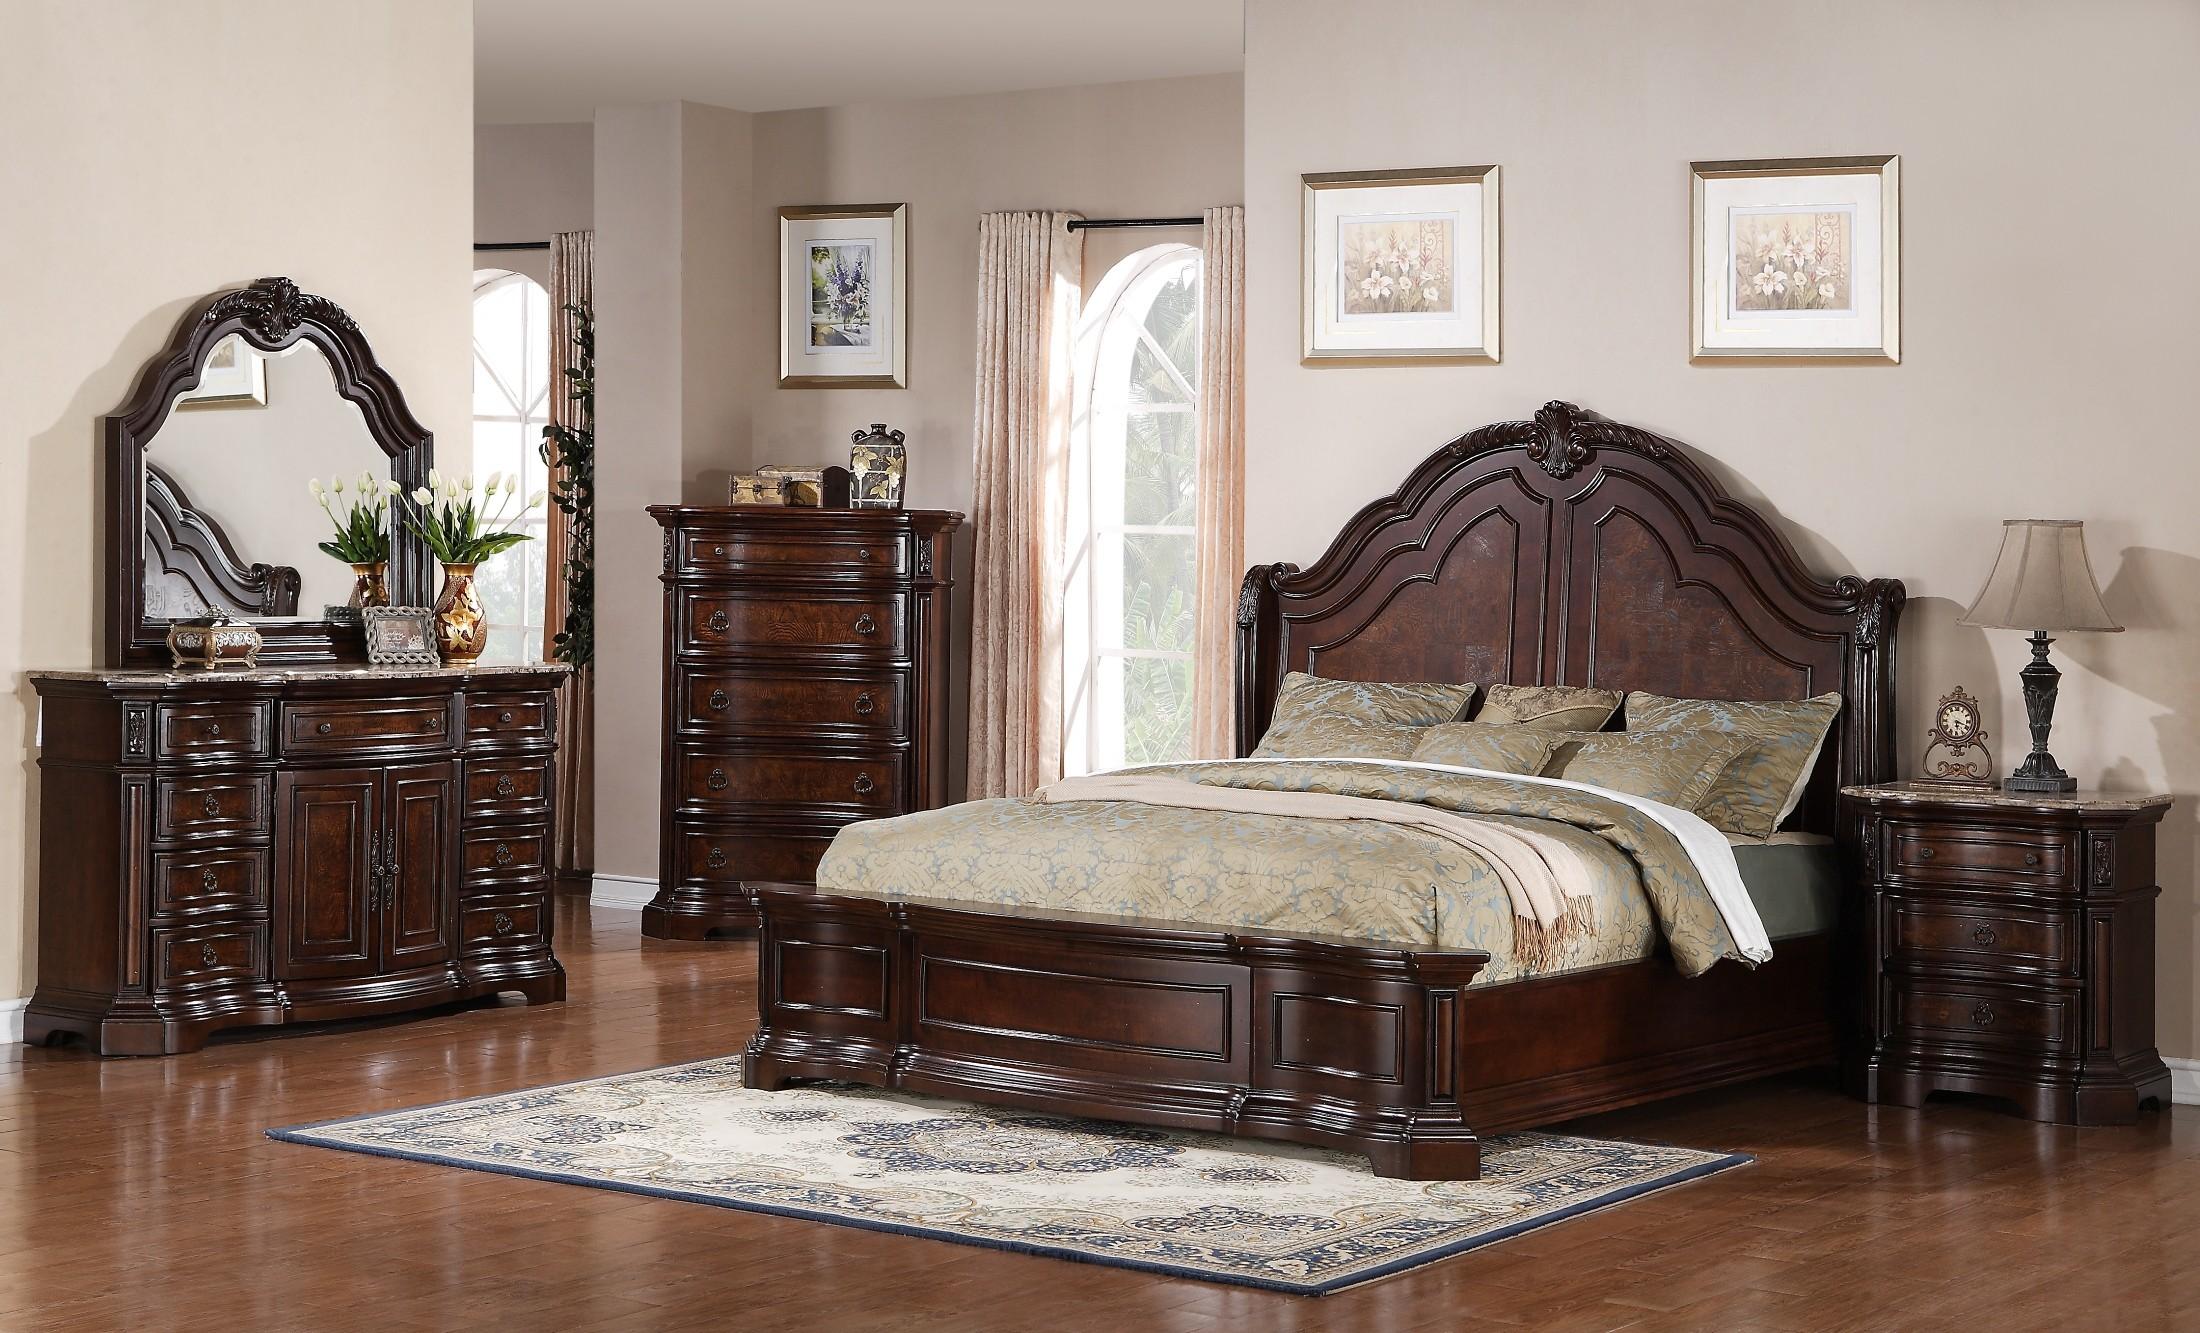 catalouge adorable king california cherry silver furniture wood dark sets set bedroom used